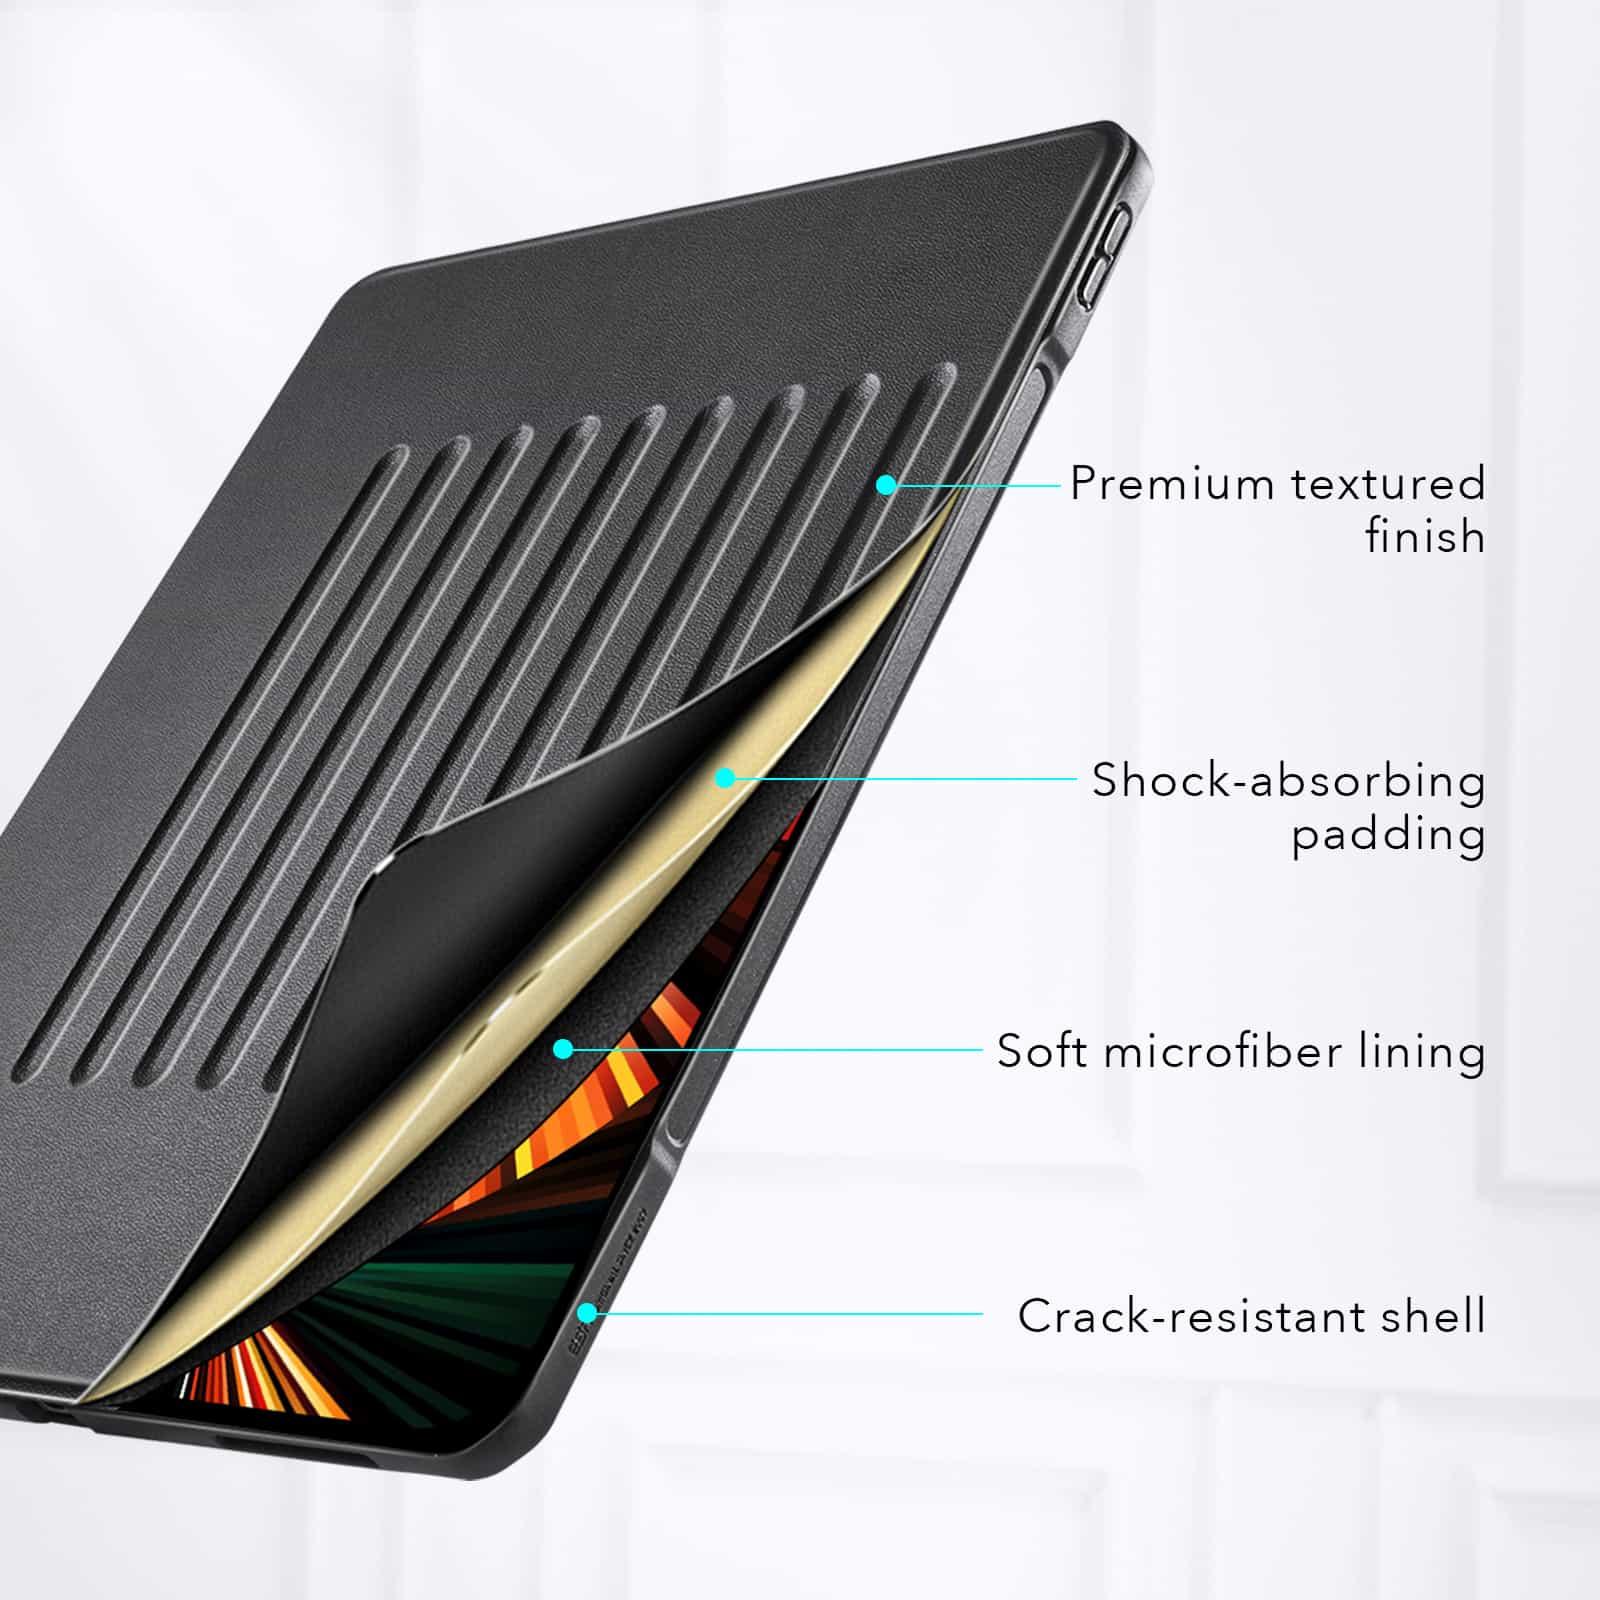 iPad Pro 12.9 2021 Rugged Protection Bundle 2